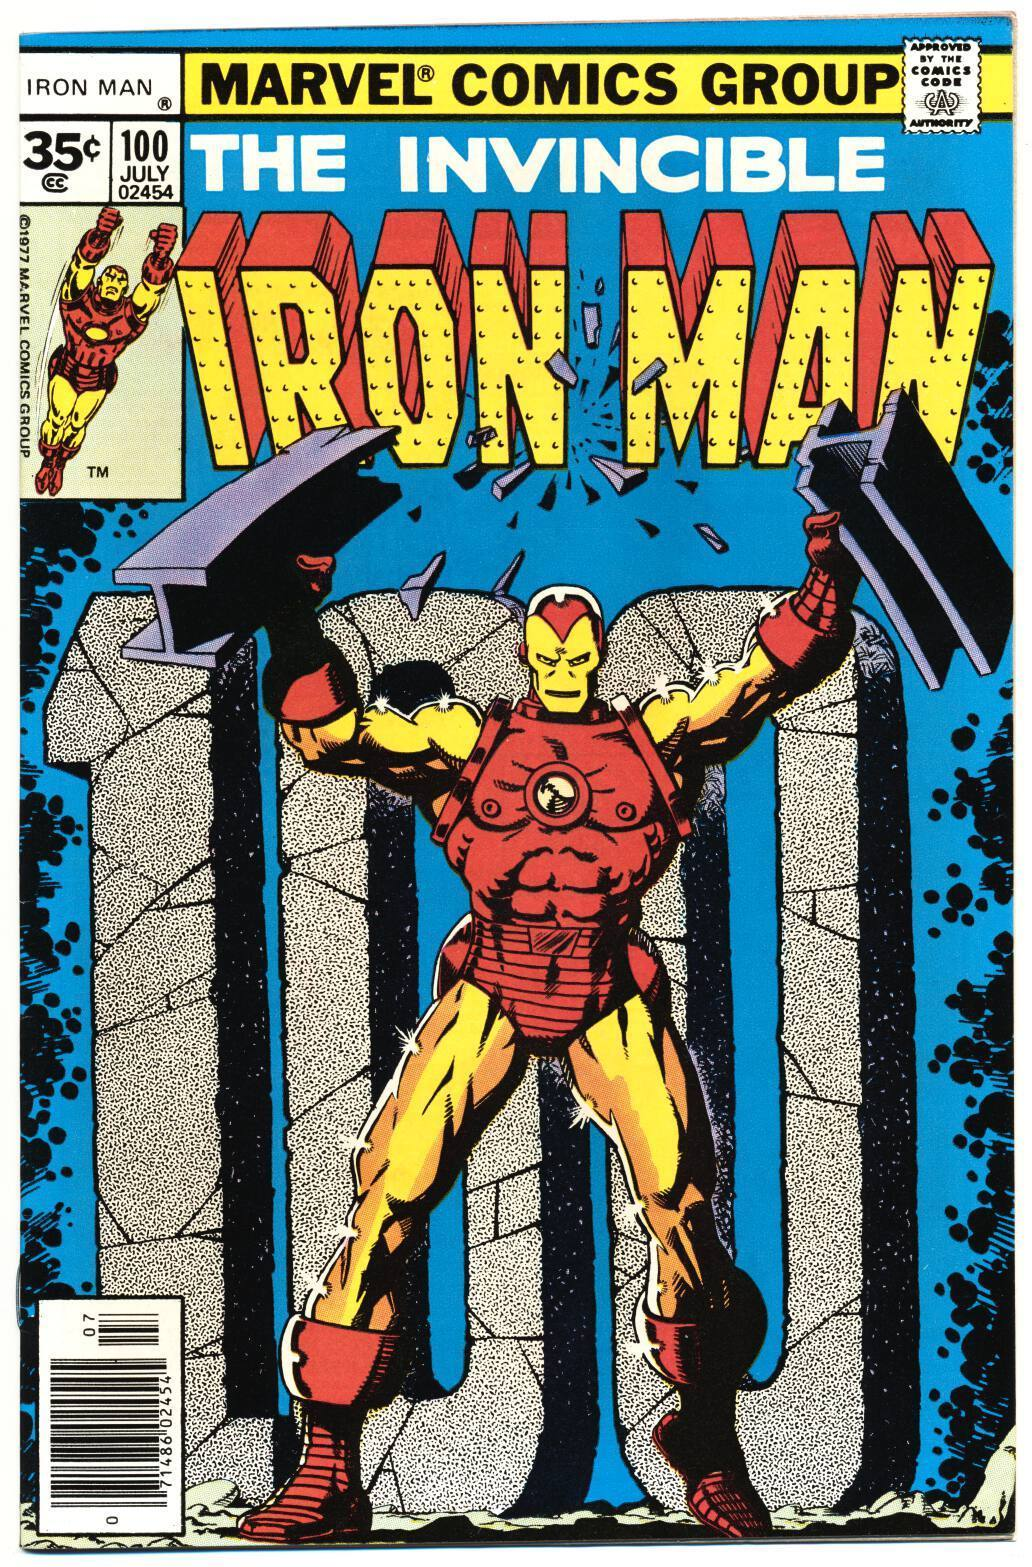 IRON MAN #100 VF, 35¢ Price Variant, Classic Jim Starlin c, Marvel Comics 1977